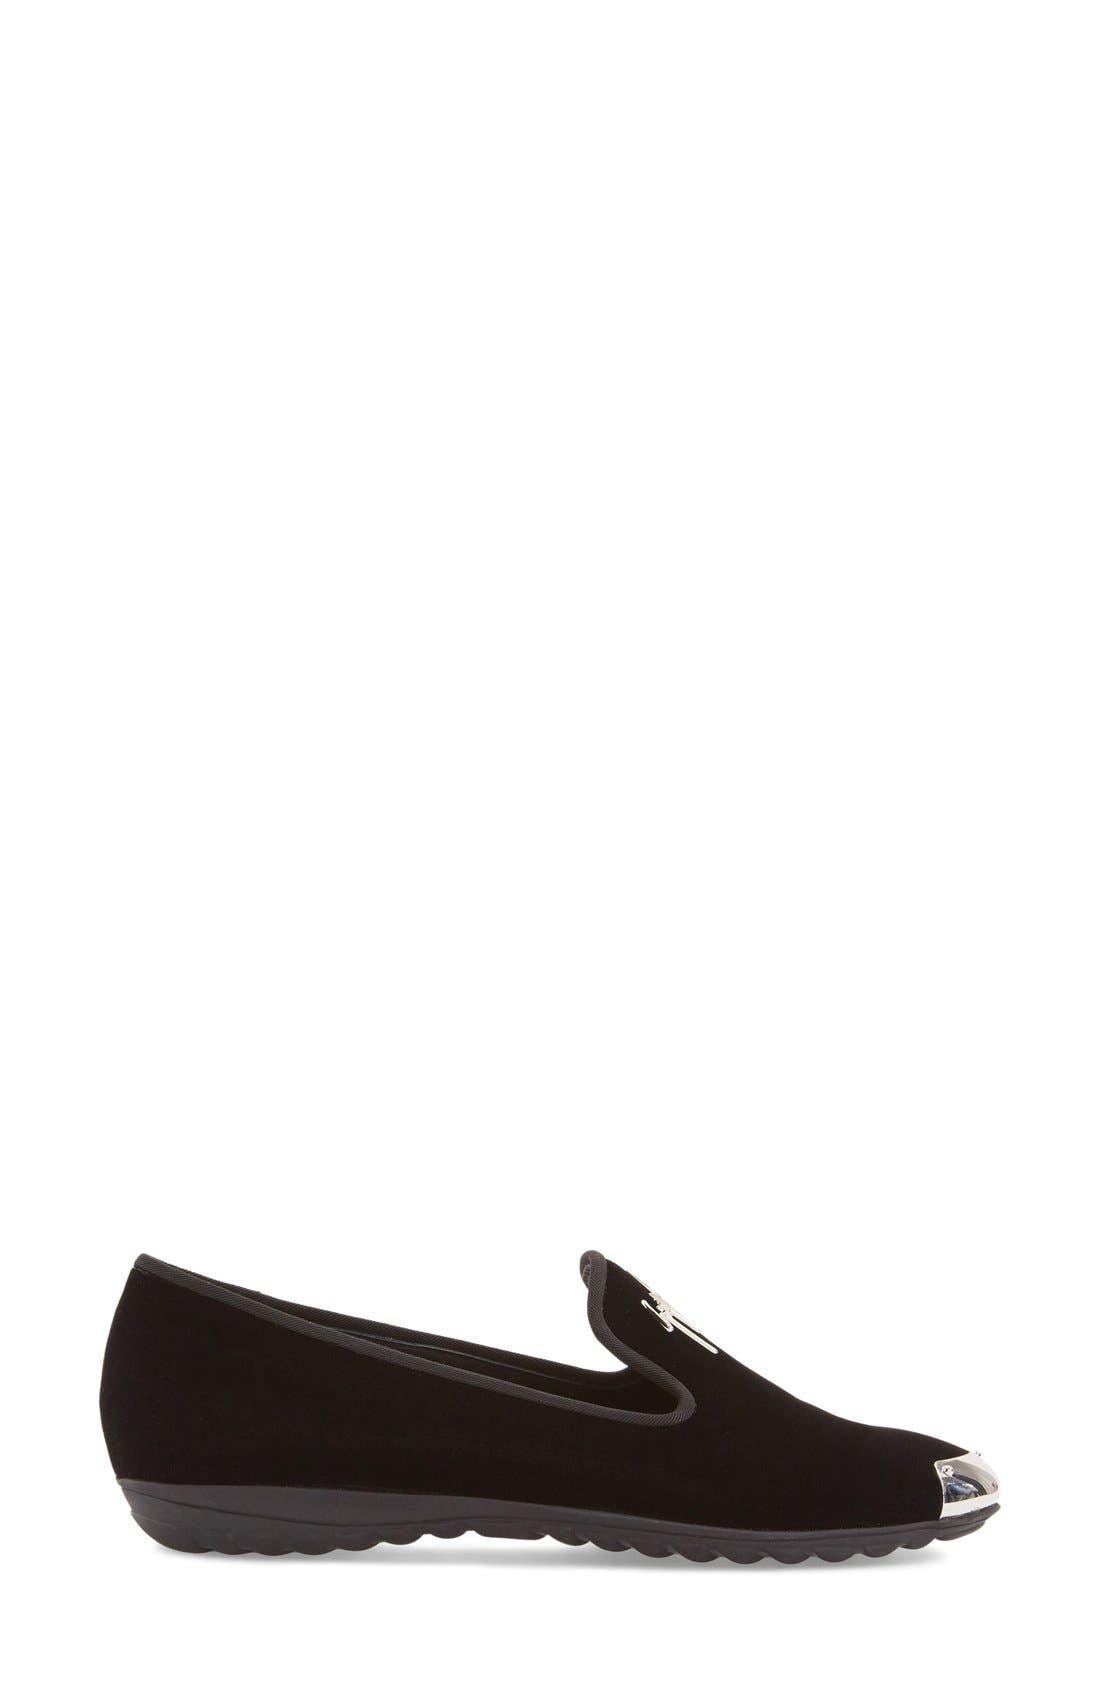 Alternate Image 4  - Giuseppe Zanotti 'Dalila' Metallic Toe Velour Loafer (Women) (Nordstrom Exclusive)